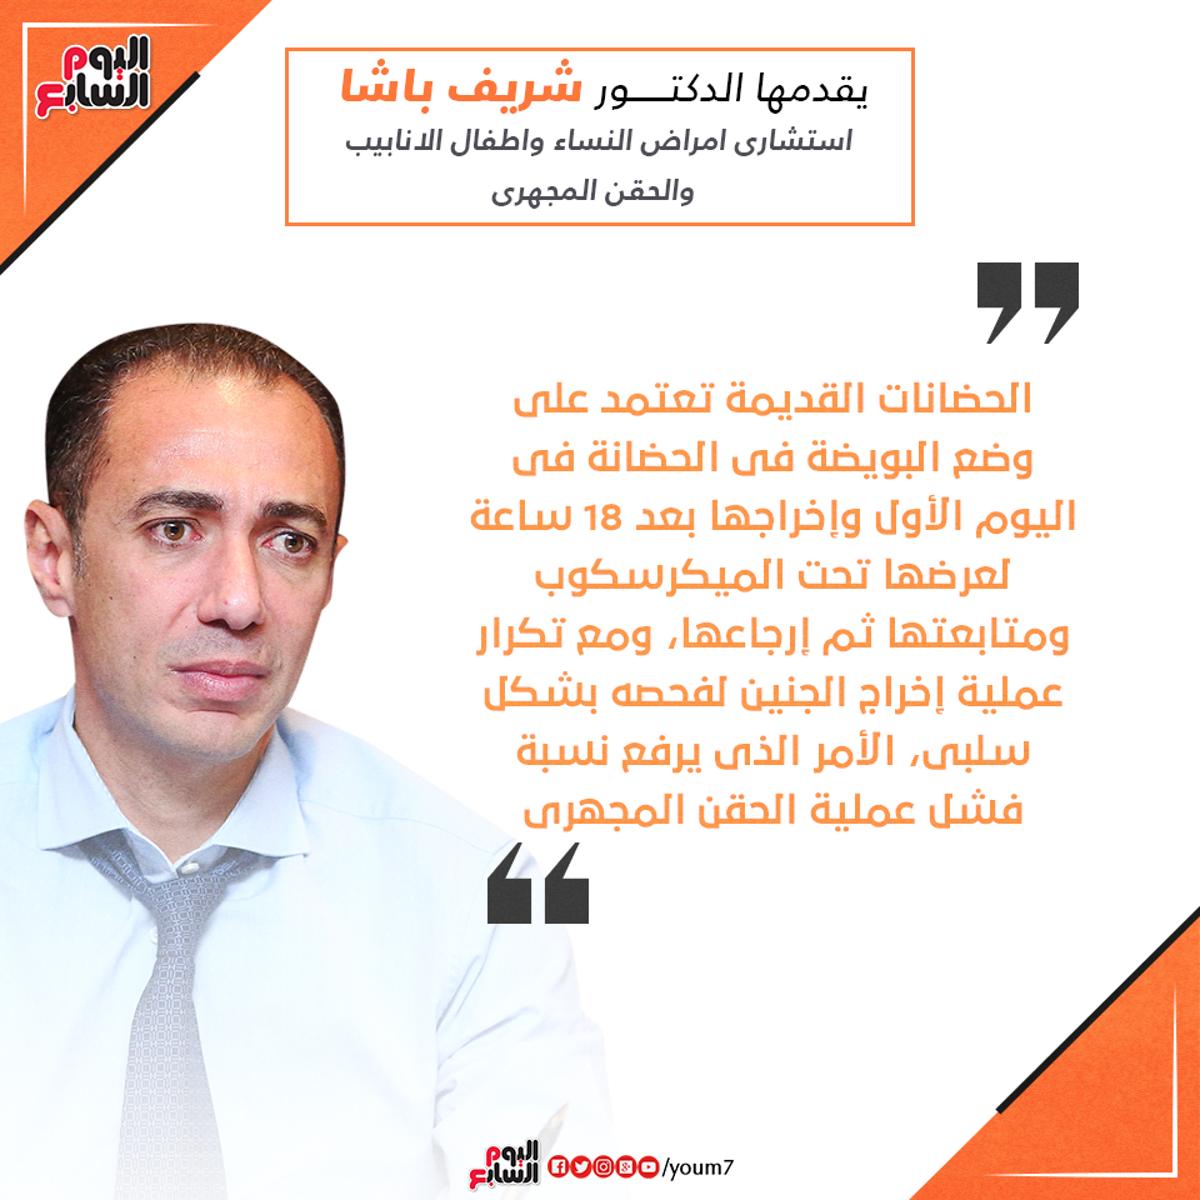 f96467fb0 10 أسئلة مهمة عن الحقن المجهرى يجيب عنها الدكتور شريف باشا - اليوم السابع